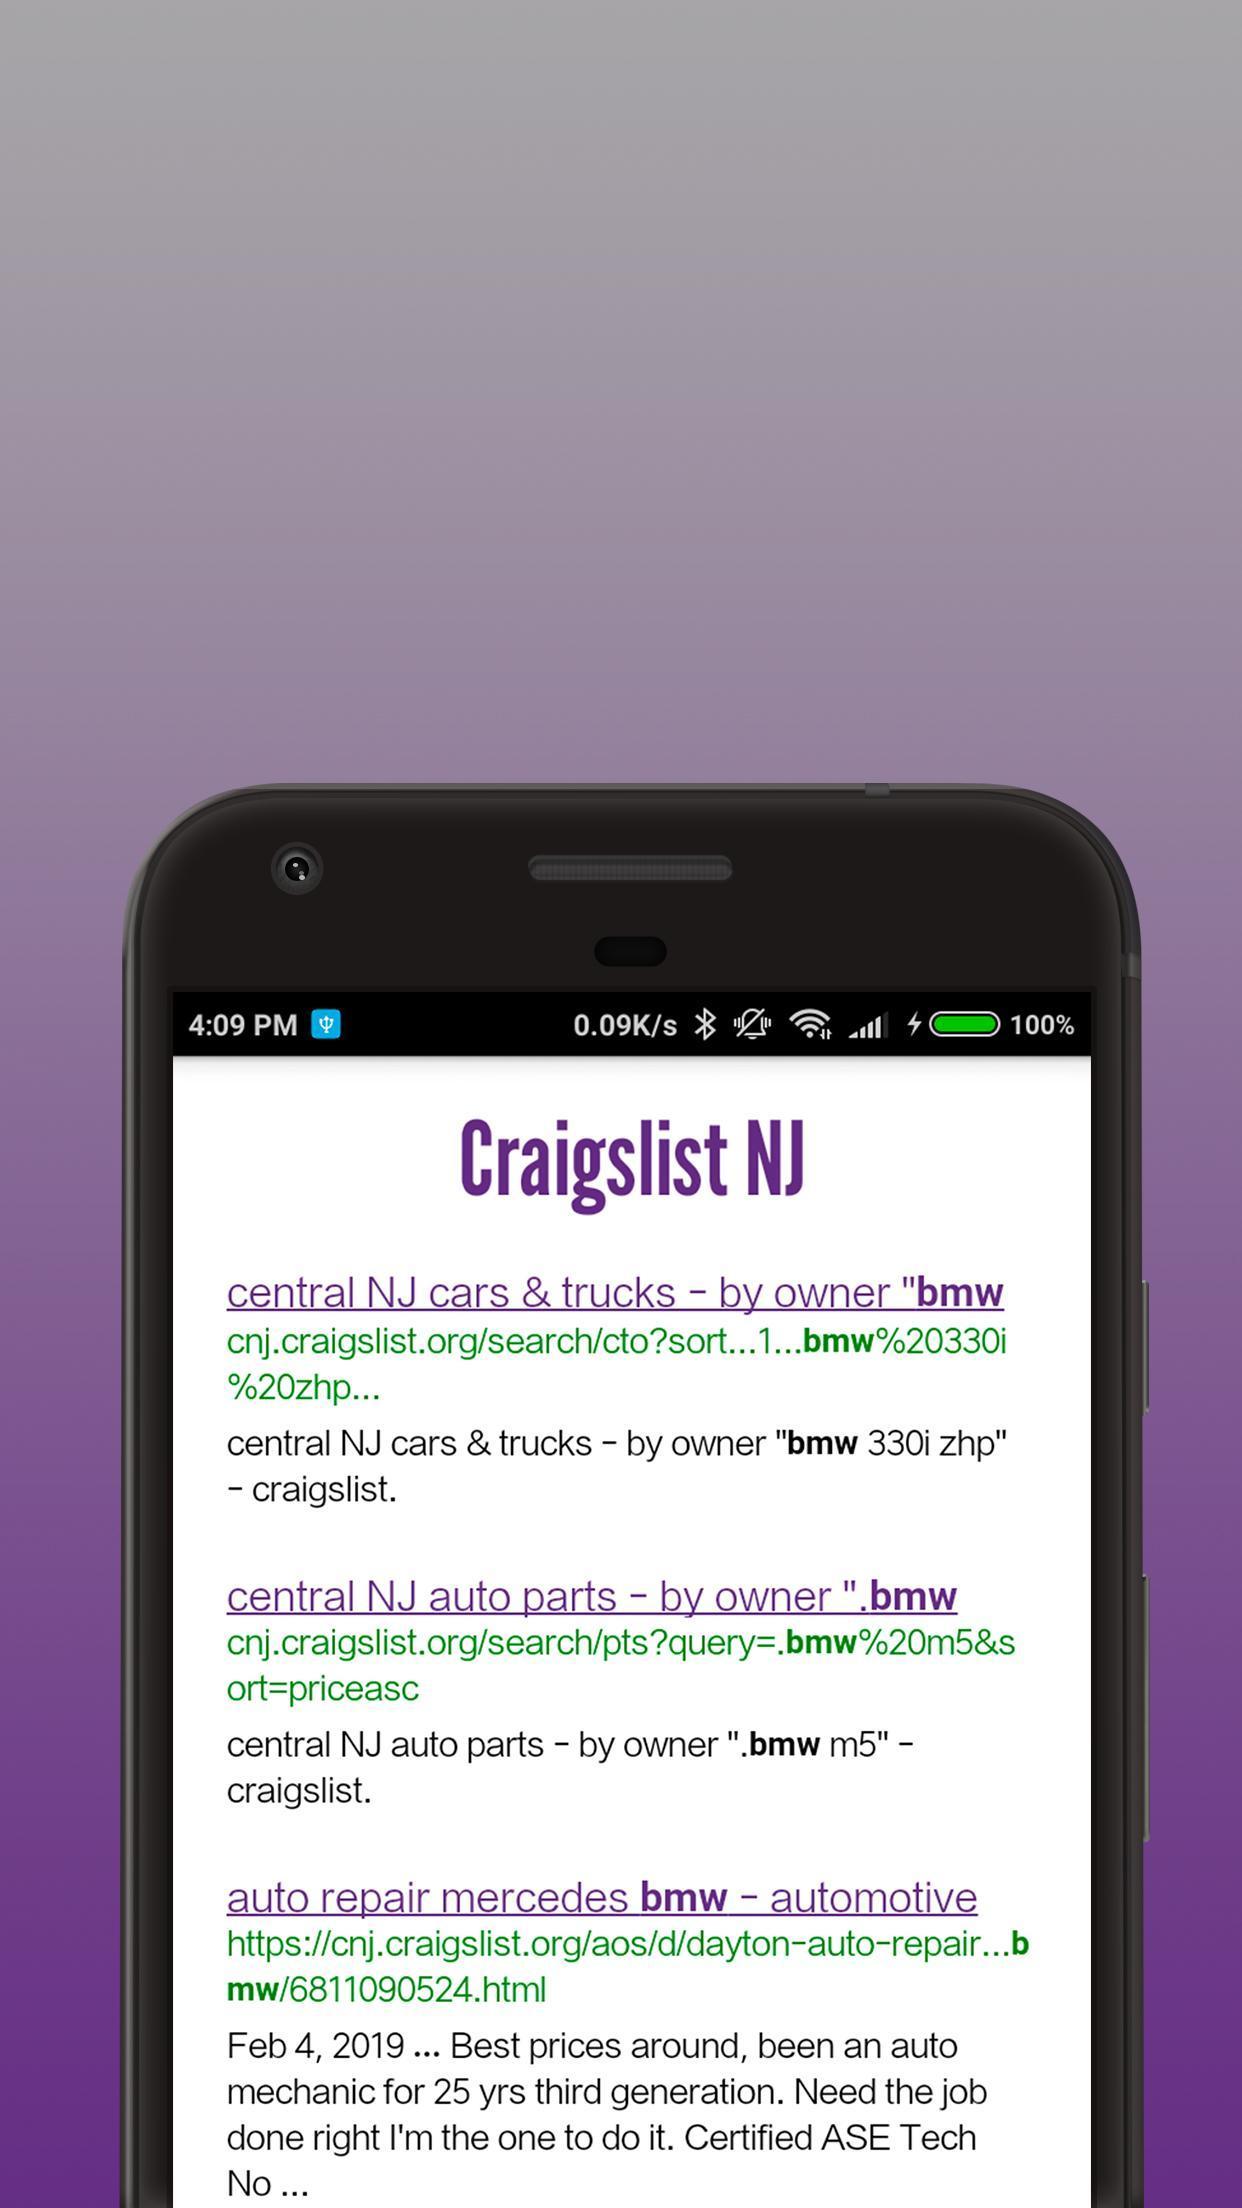 Craigslist Org Nj Central - slide share